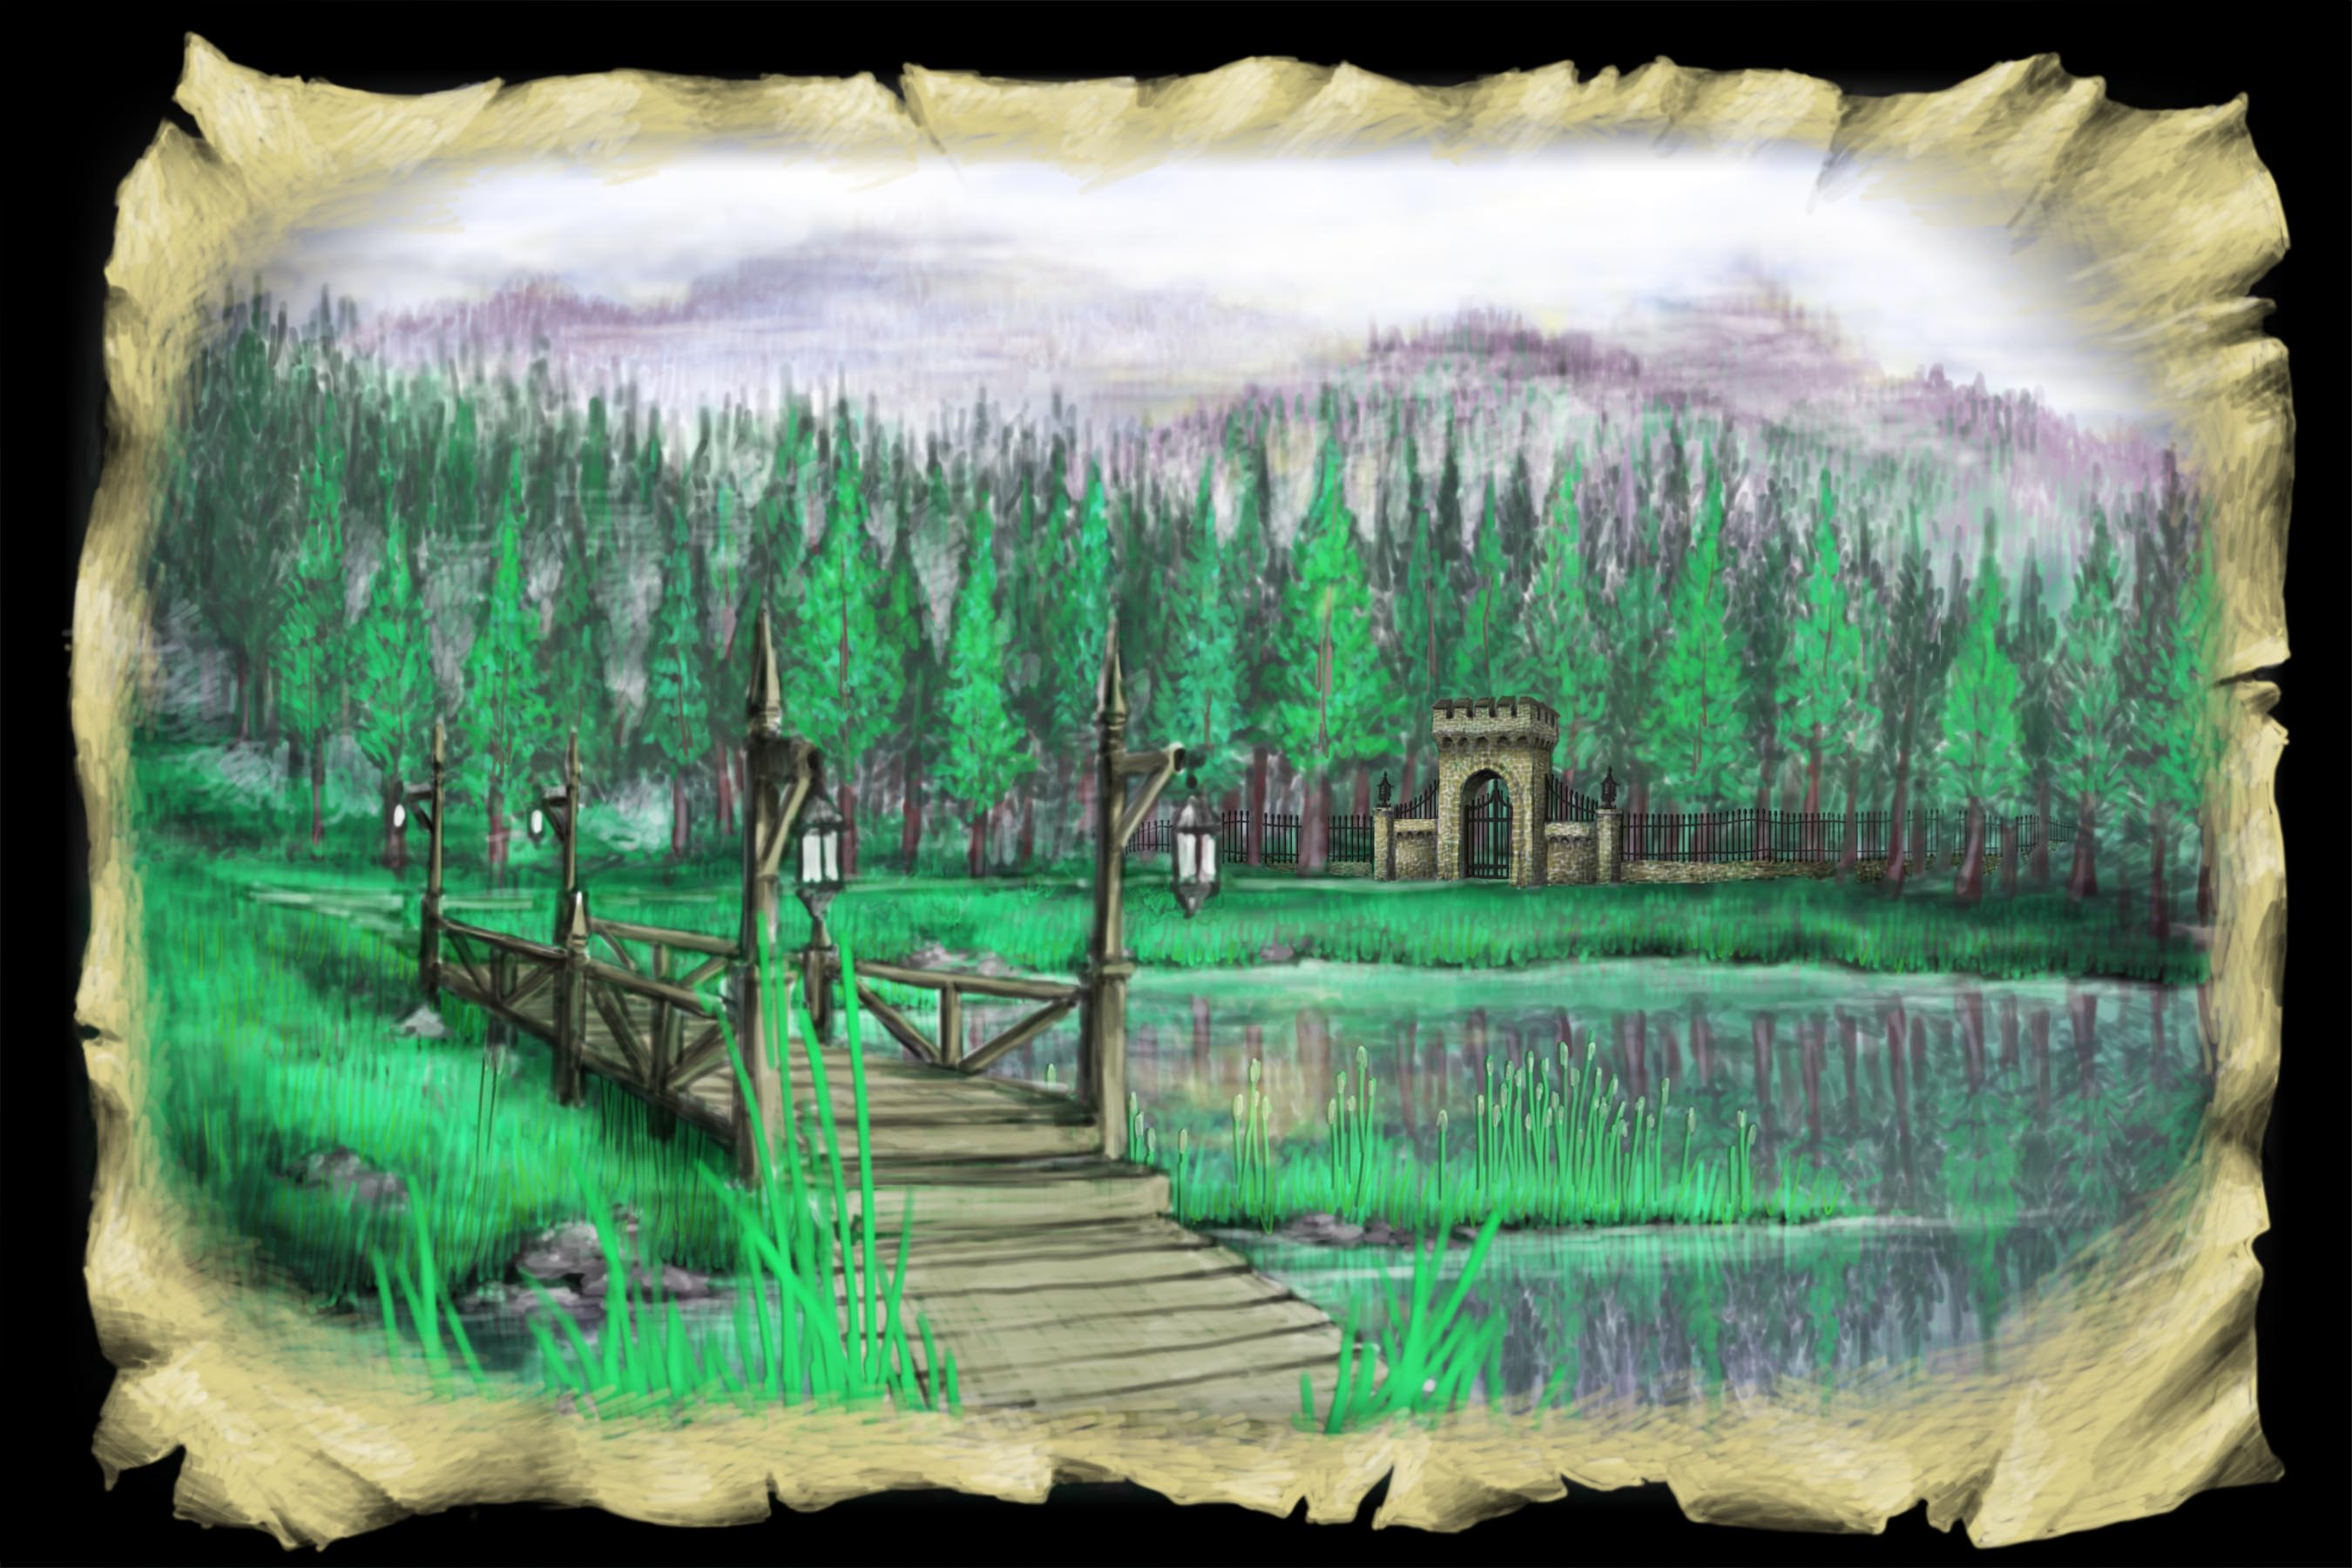 Scene 2d. Lake and Bridge, Midday